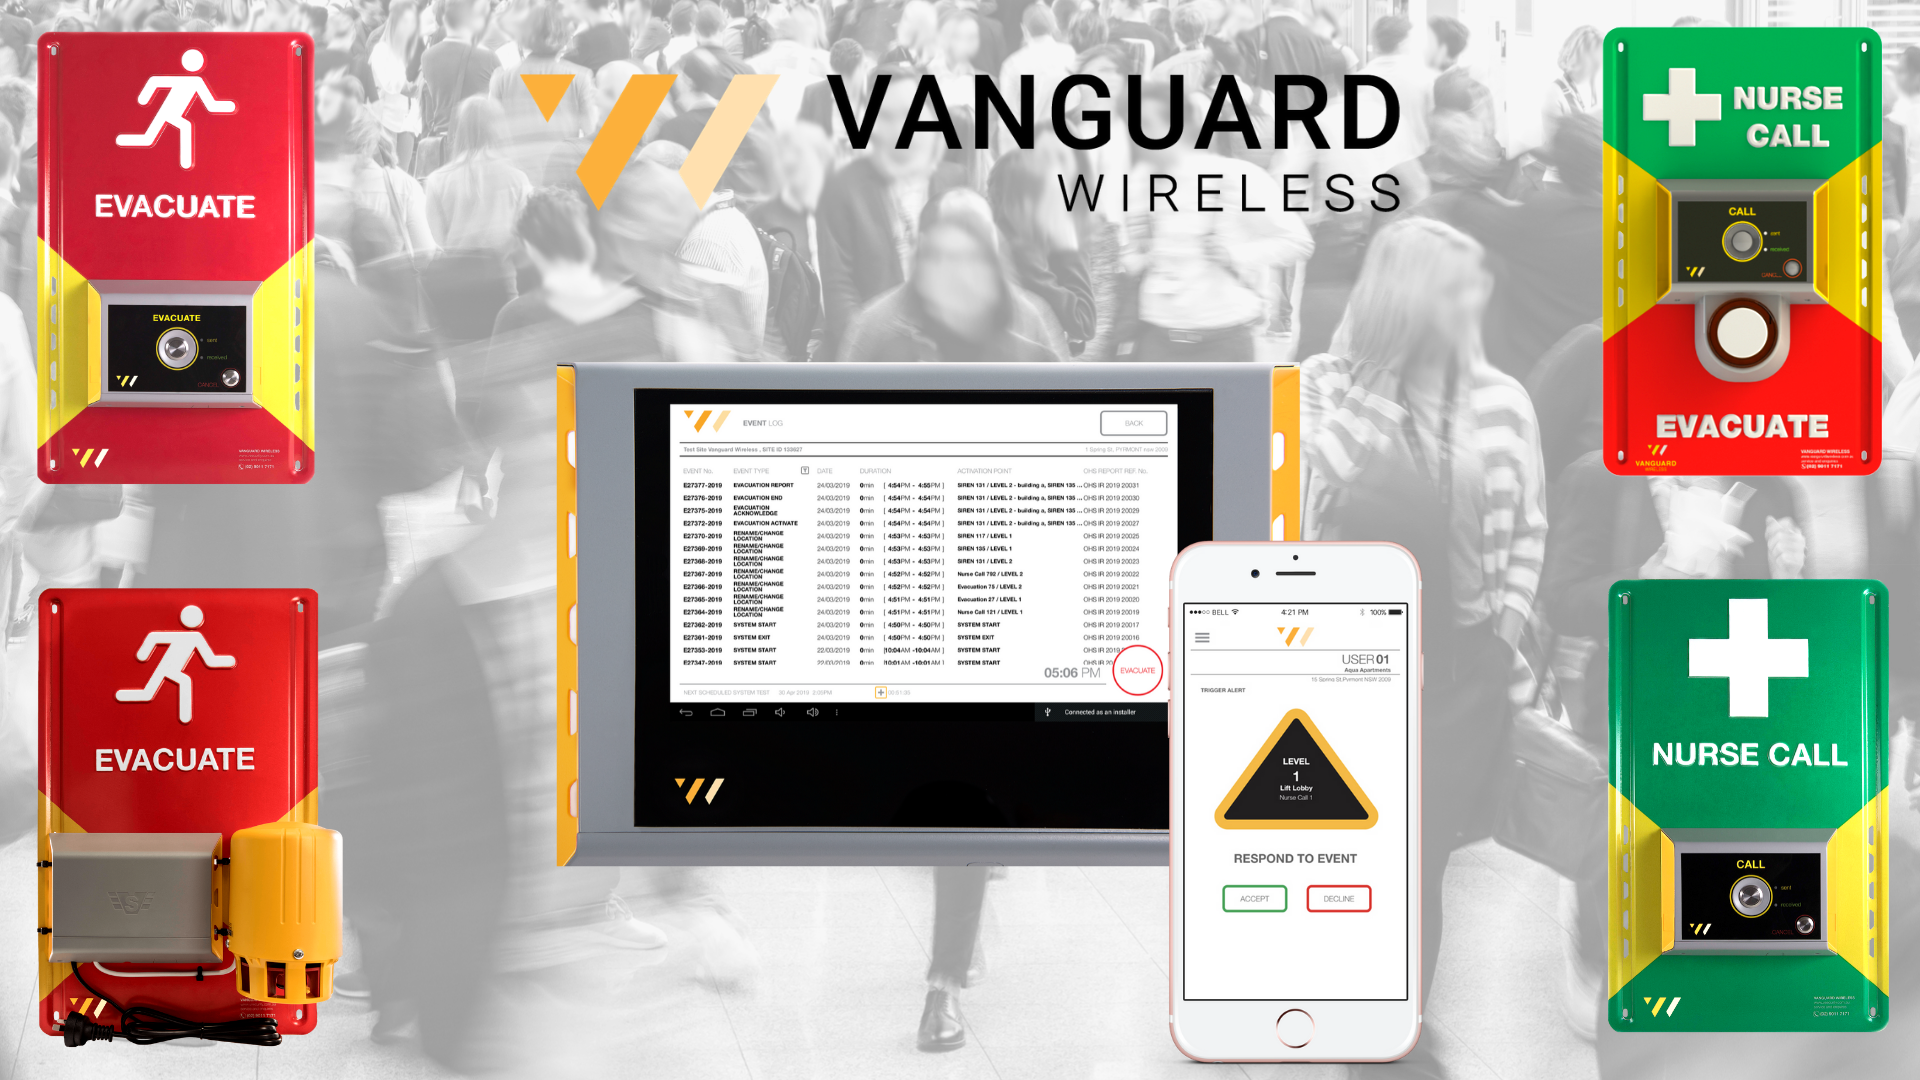 Vanguard Wireless Introduction